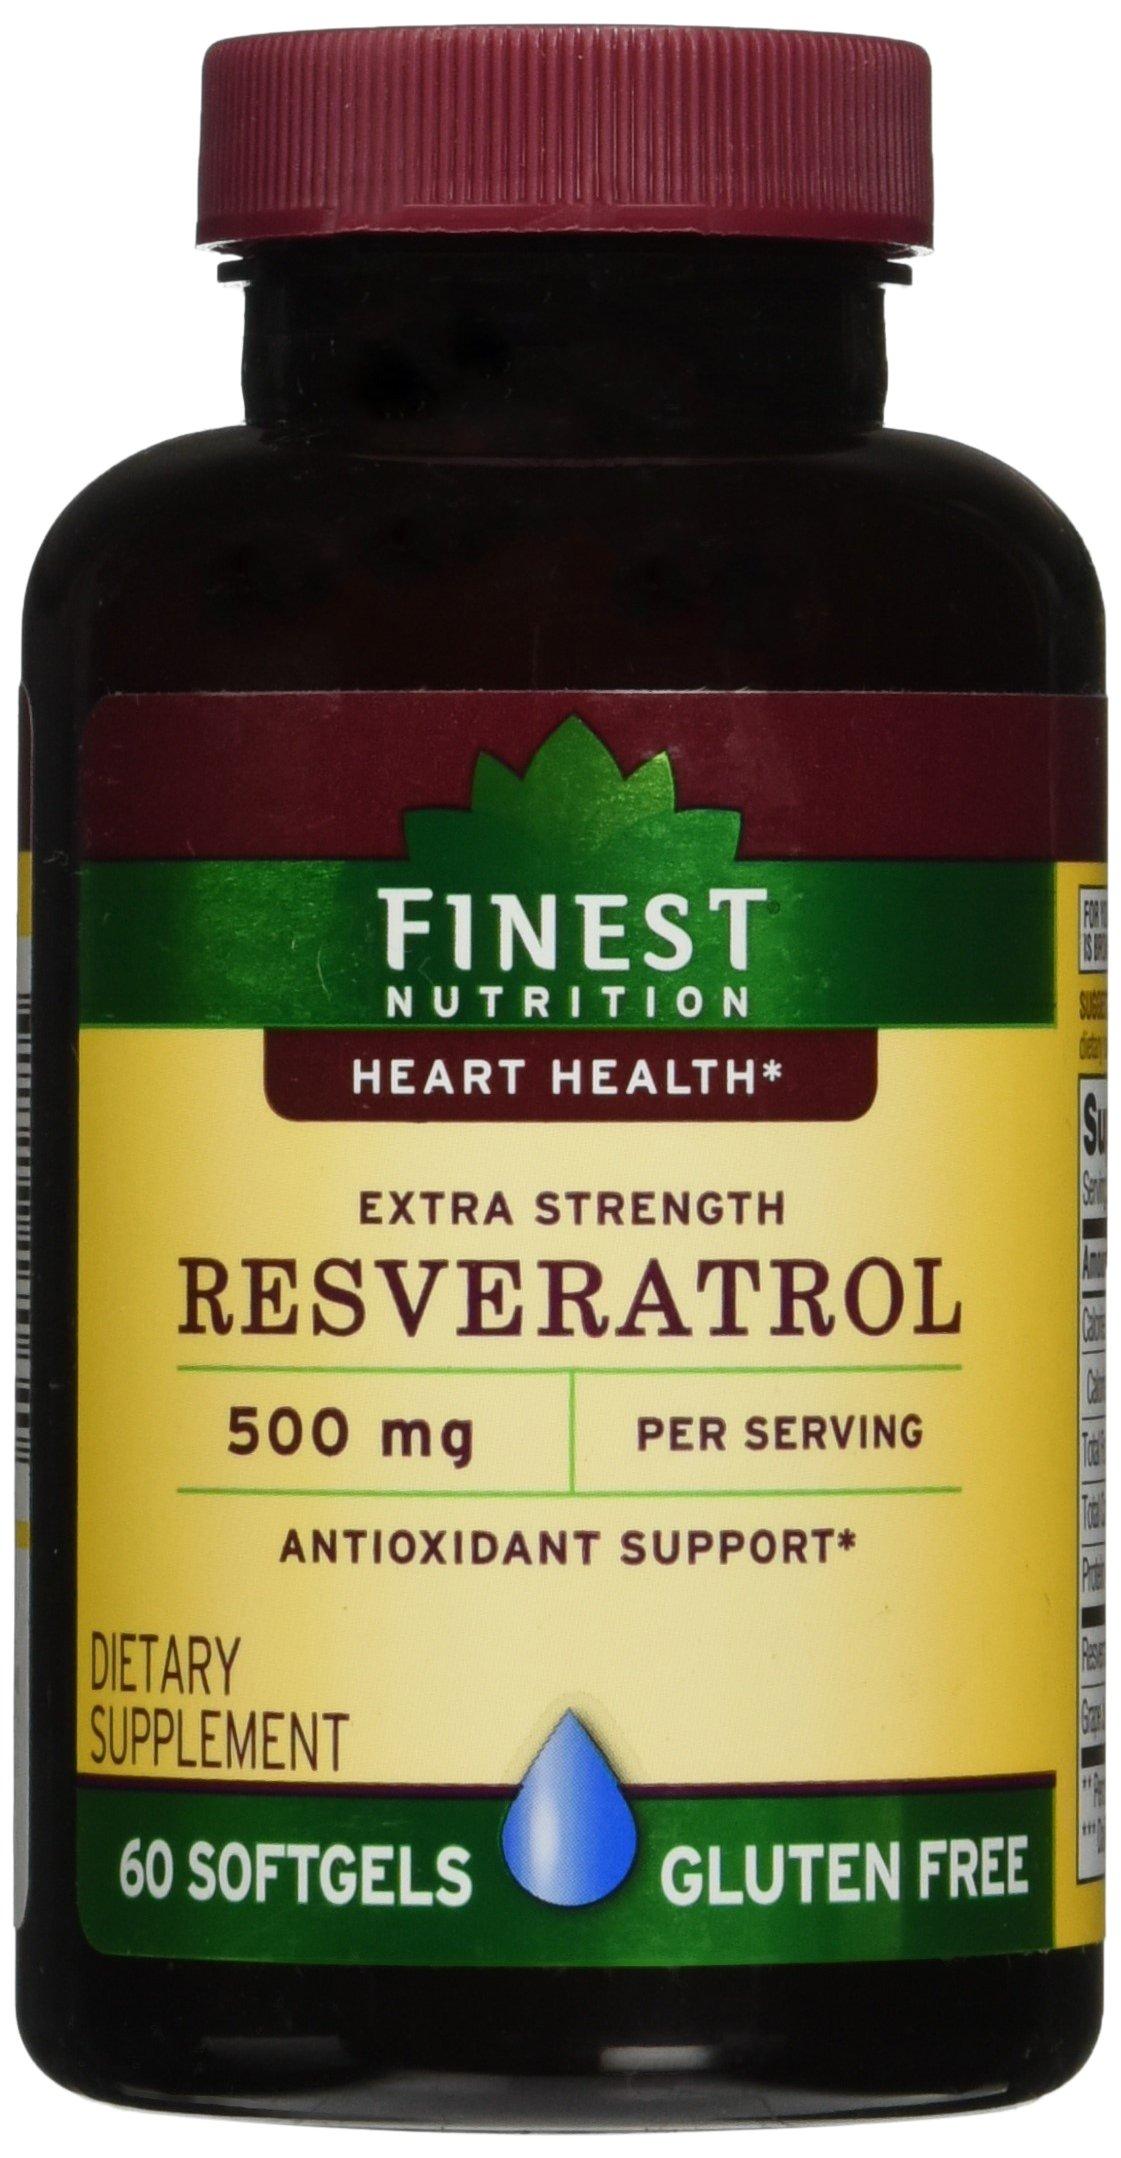 Finest Nutrition Resveratrol 500mg Extra Strength, Softgels, 60 ea